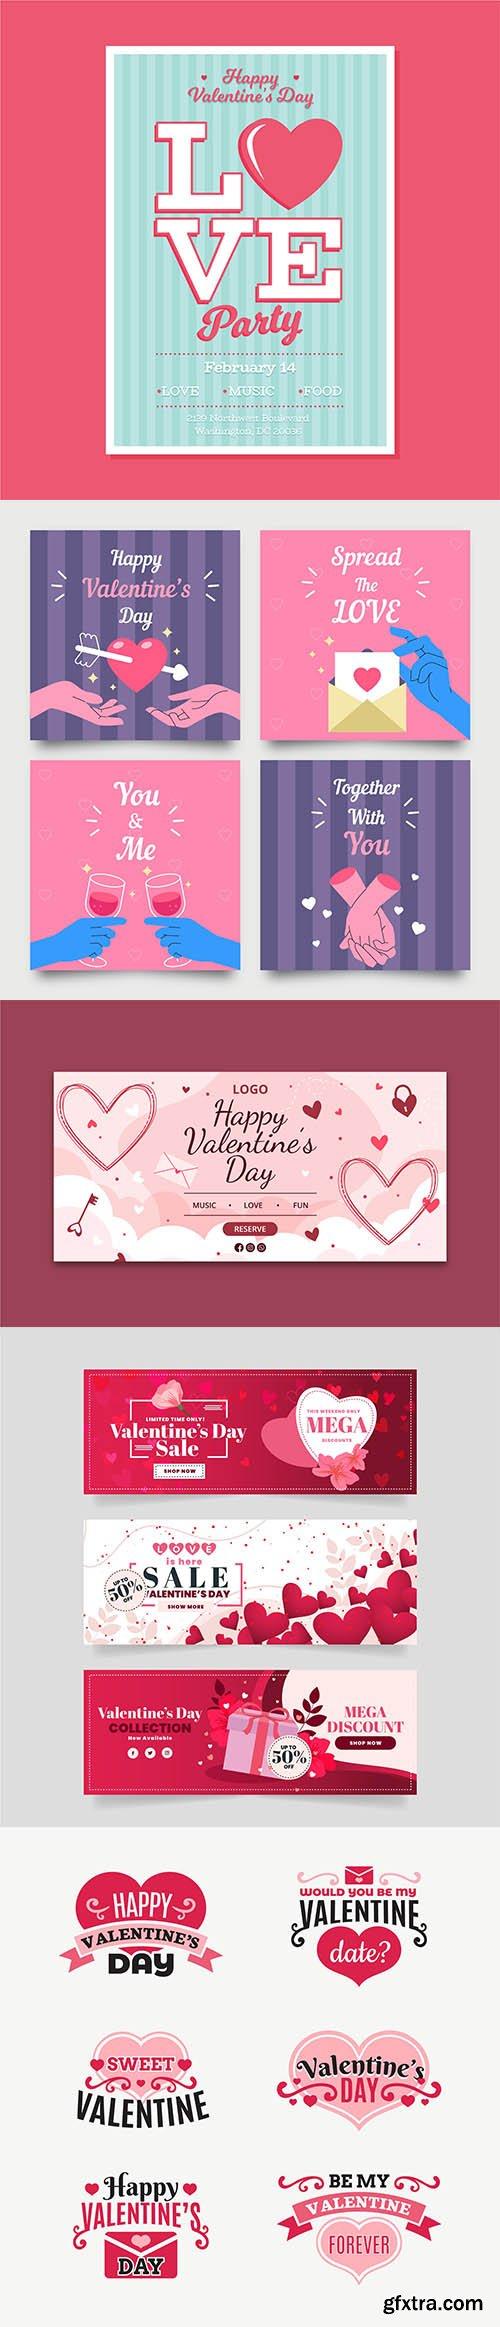 Happy Valentines day vector collection vol 2